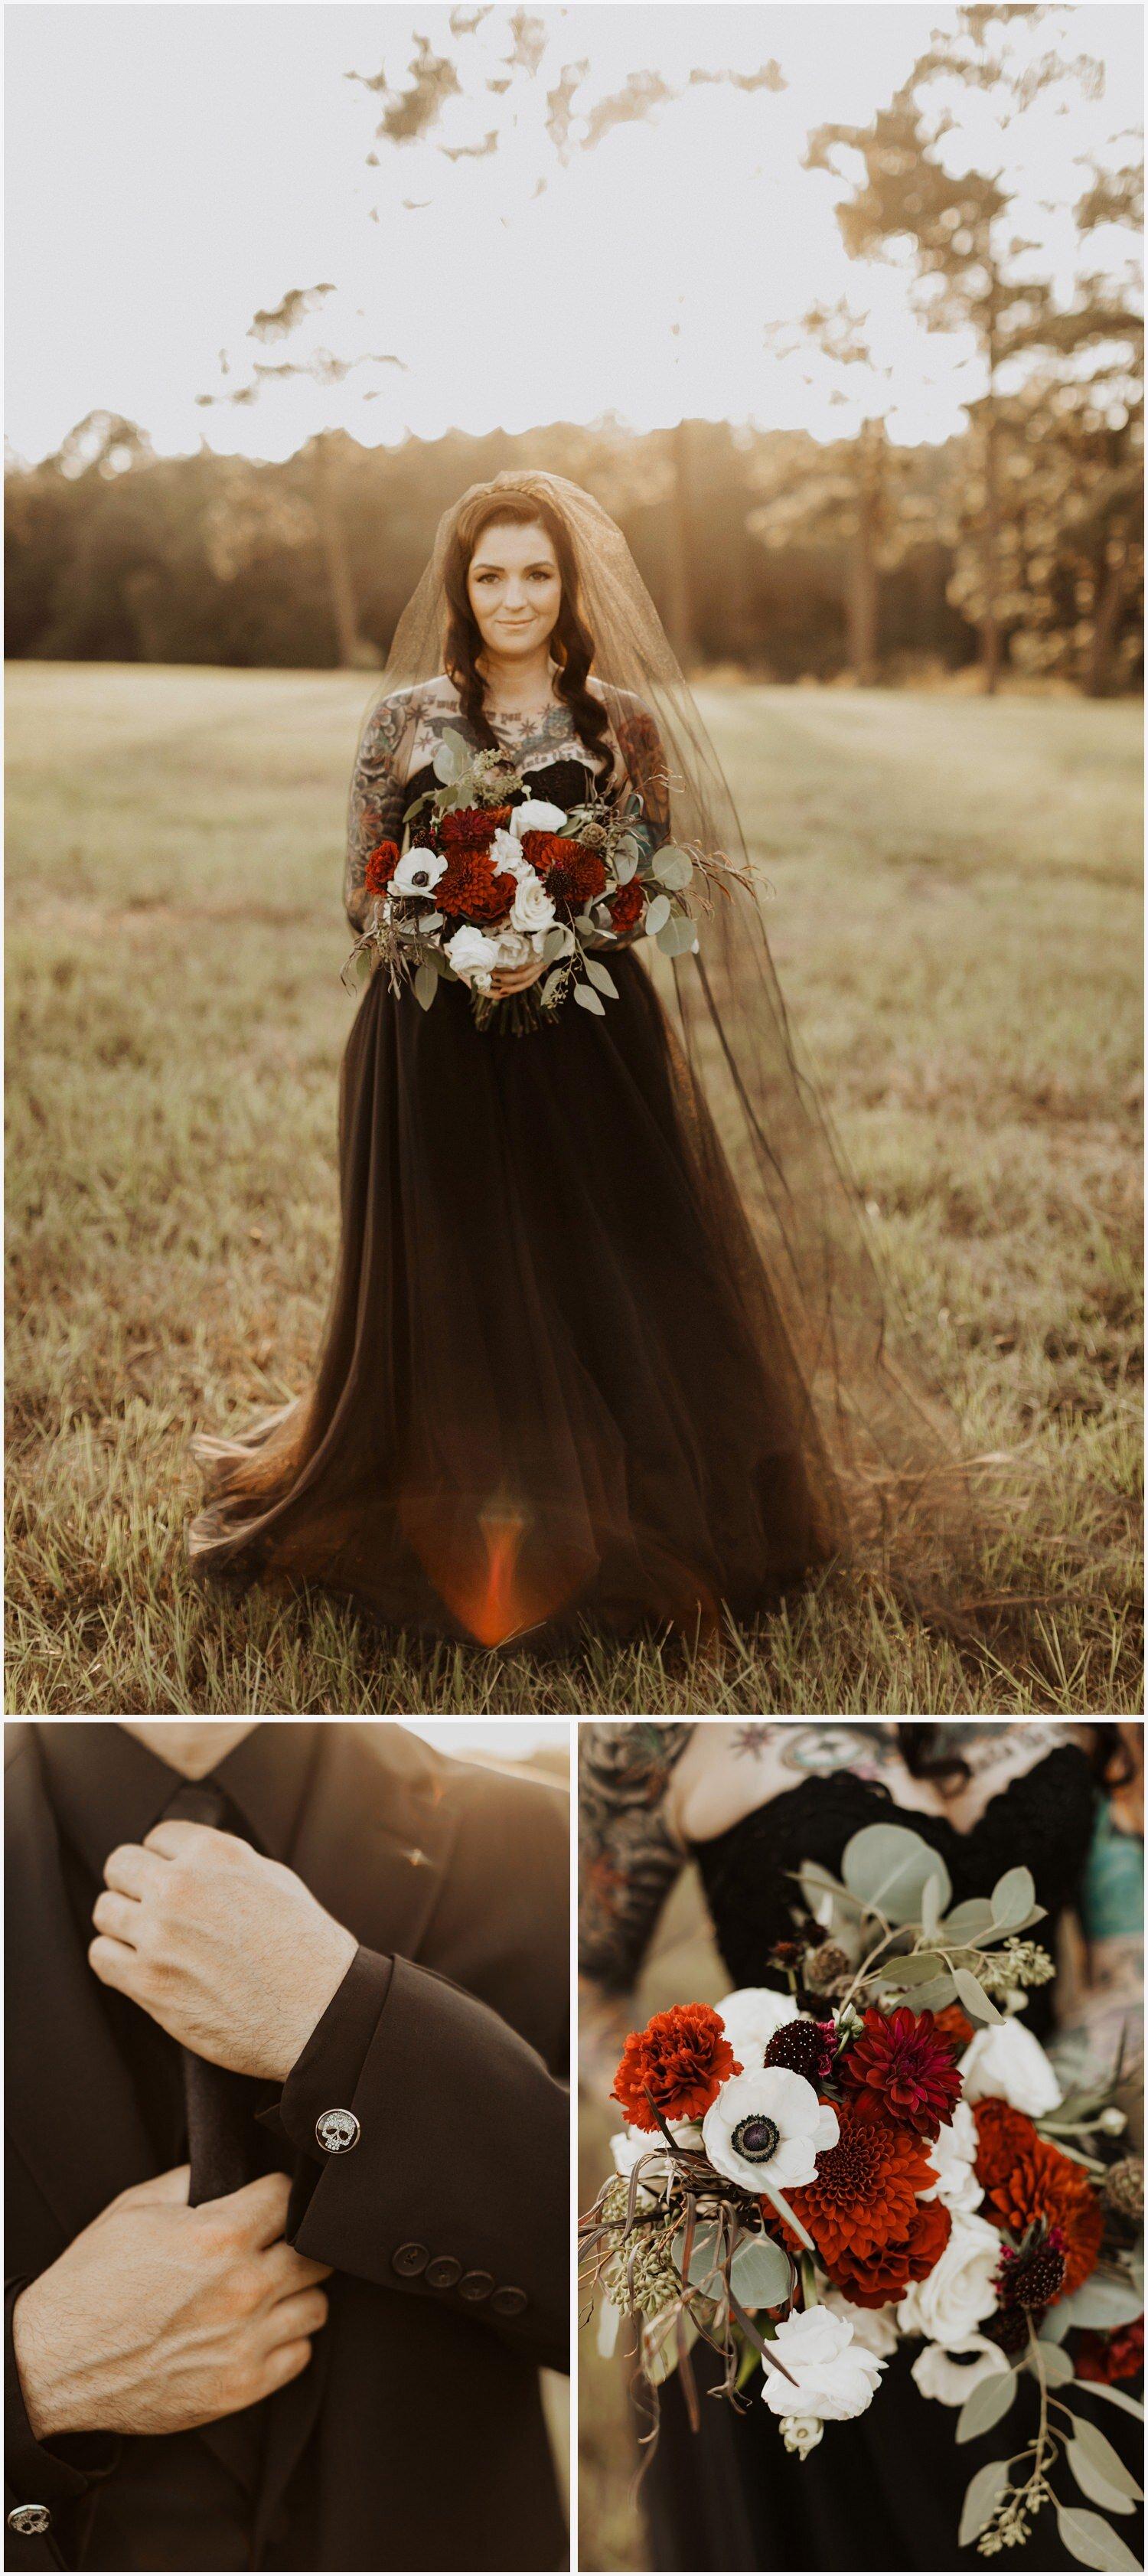 Camp Retreat Halloween Wedding Bride and Groom